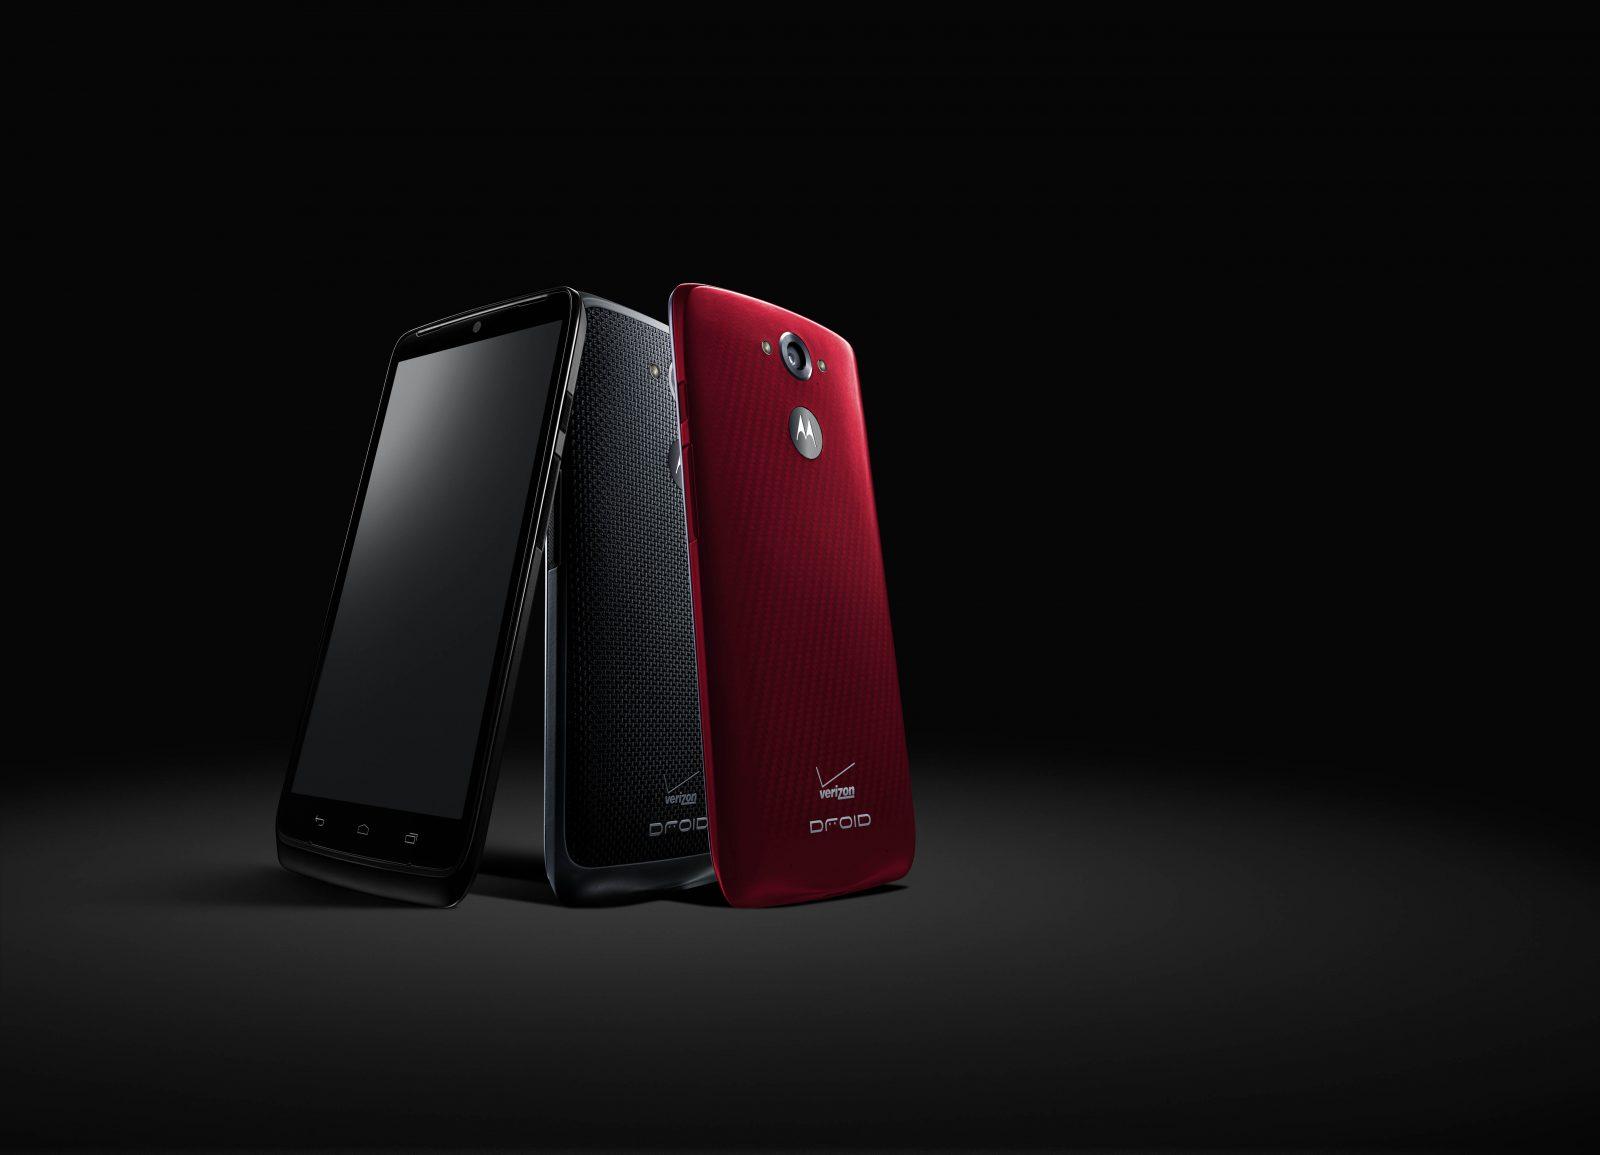 Motorola DROID Turbo - Verizon Wireless - 3 colors